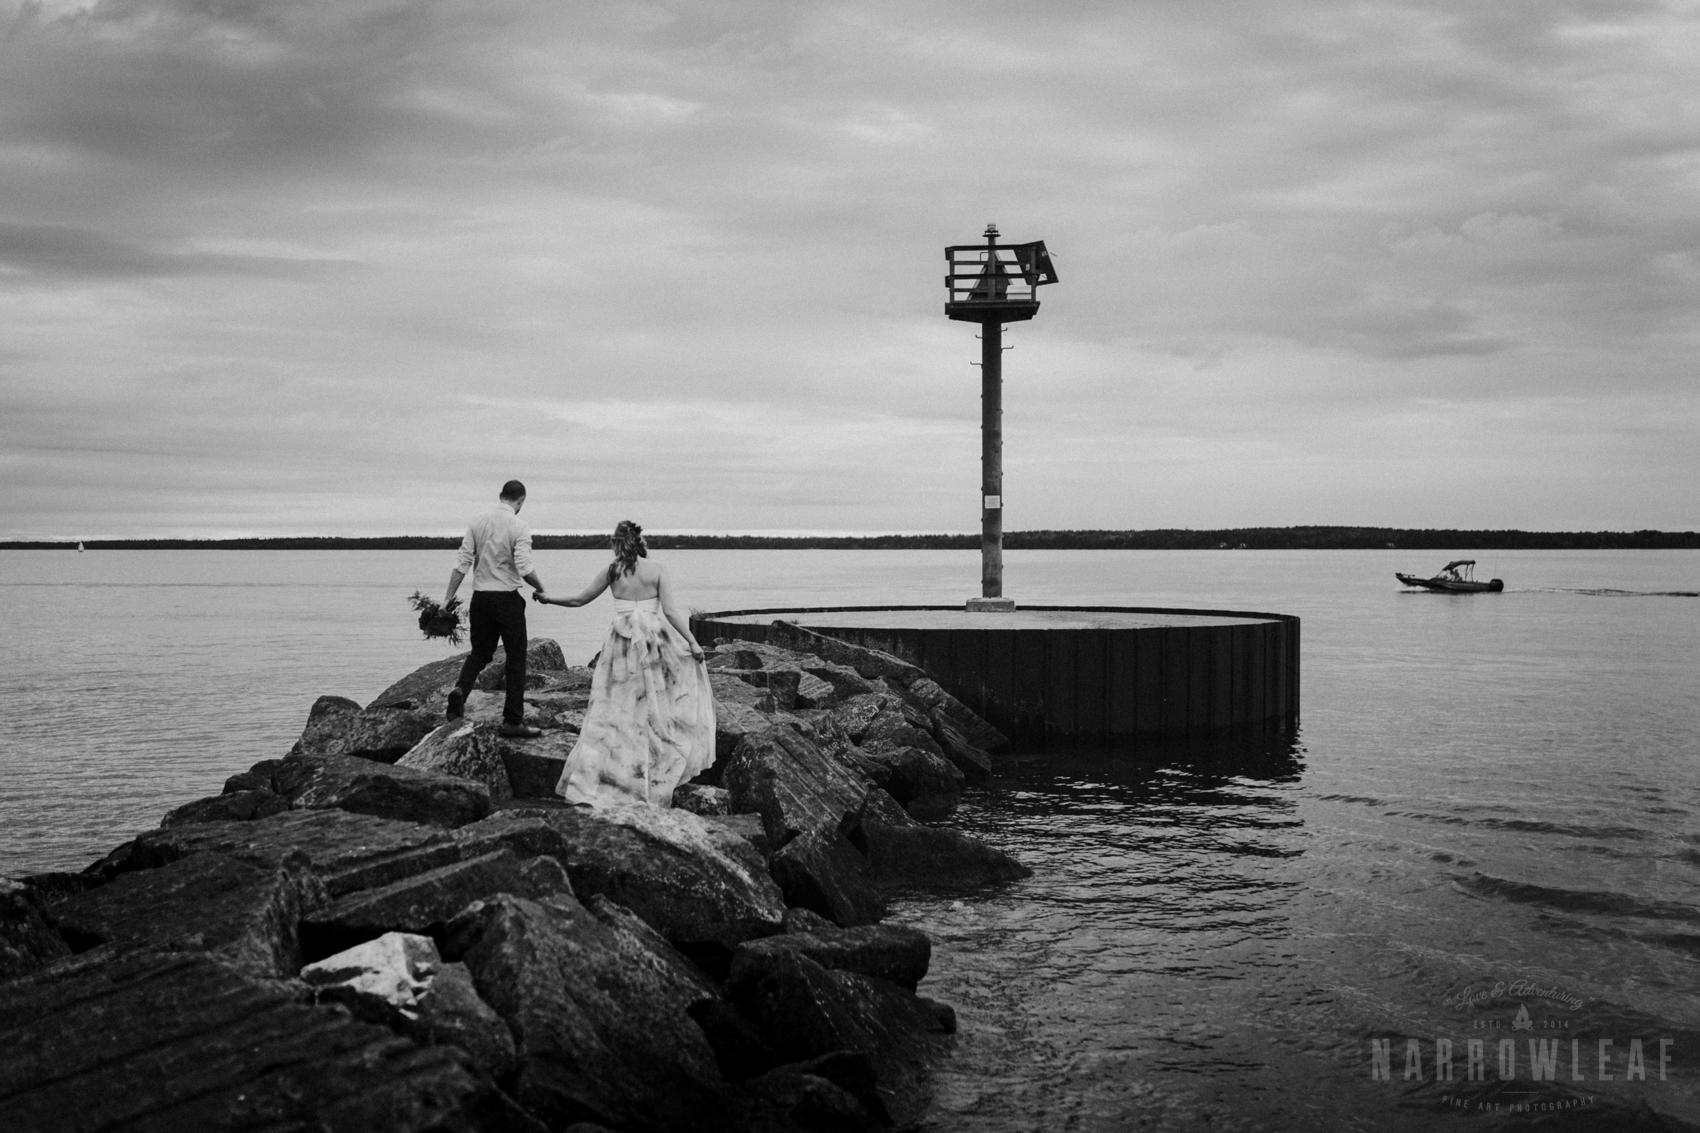 bayfield-wi-lake-superior-wedding-moody-styled-bride-groom-photos-17.jpg